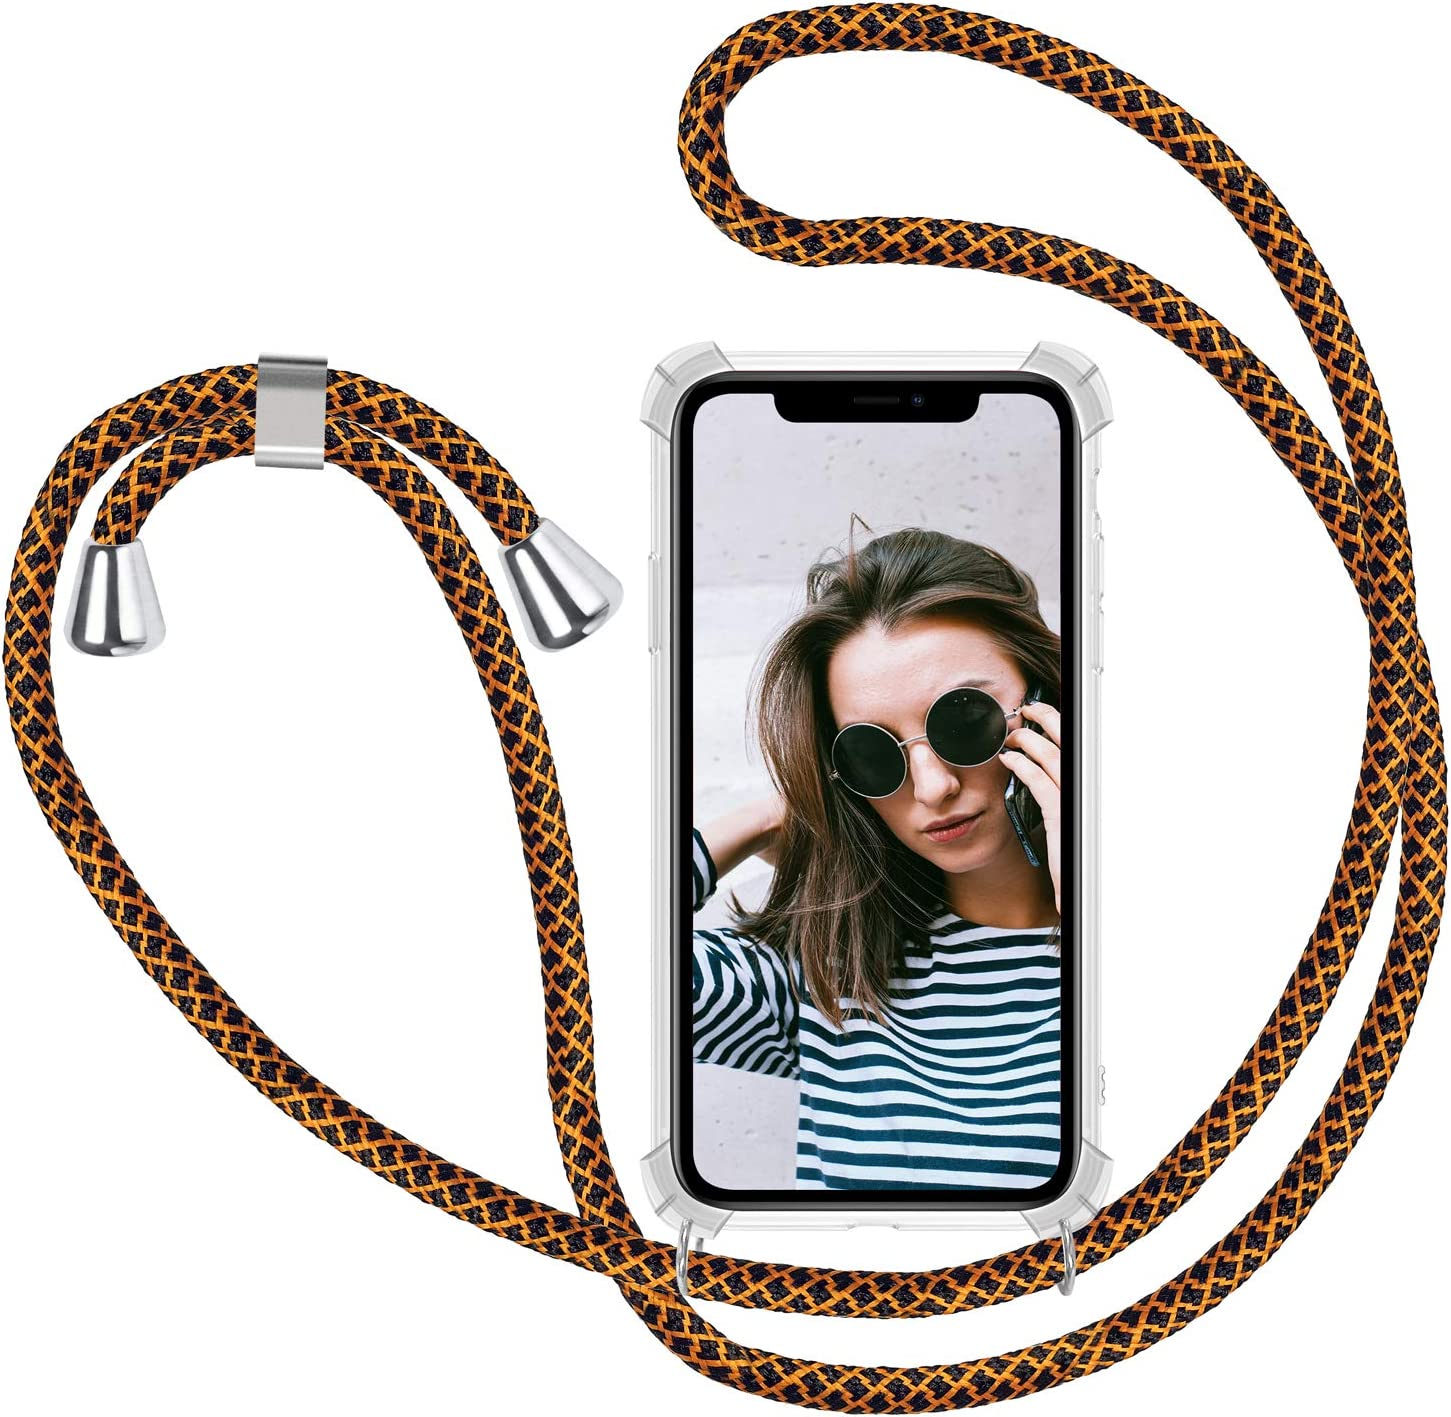 Oro Negro Funda para Cuerda Samsung Galaxy S6 Edge Carcasa Transparente de Correa Colgante Collar Ultrafino Ultraligero Moda Practico Silicona TPU Gel Case Anti-Choque Anti-rasgu/ños